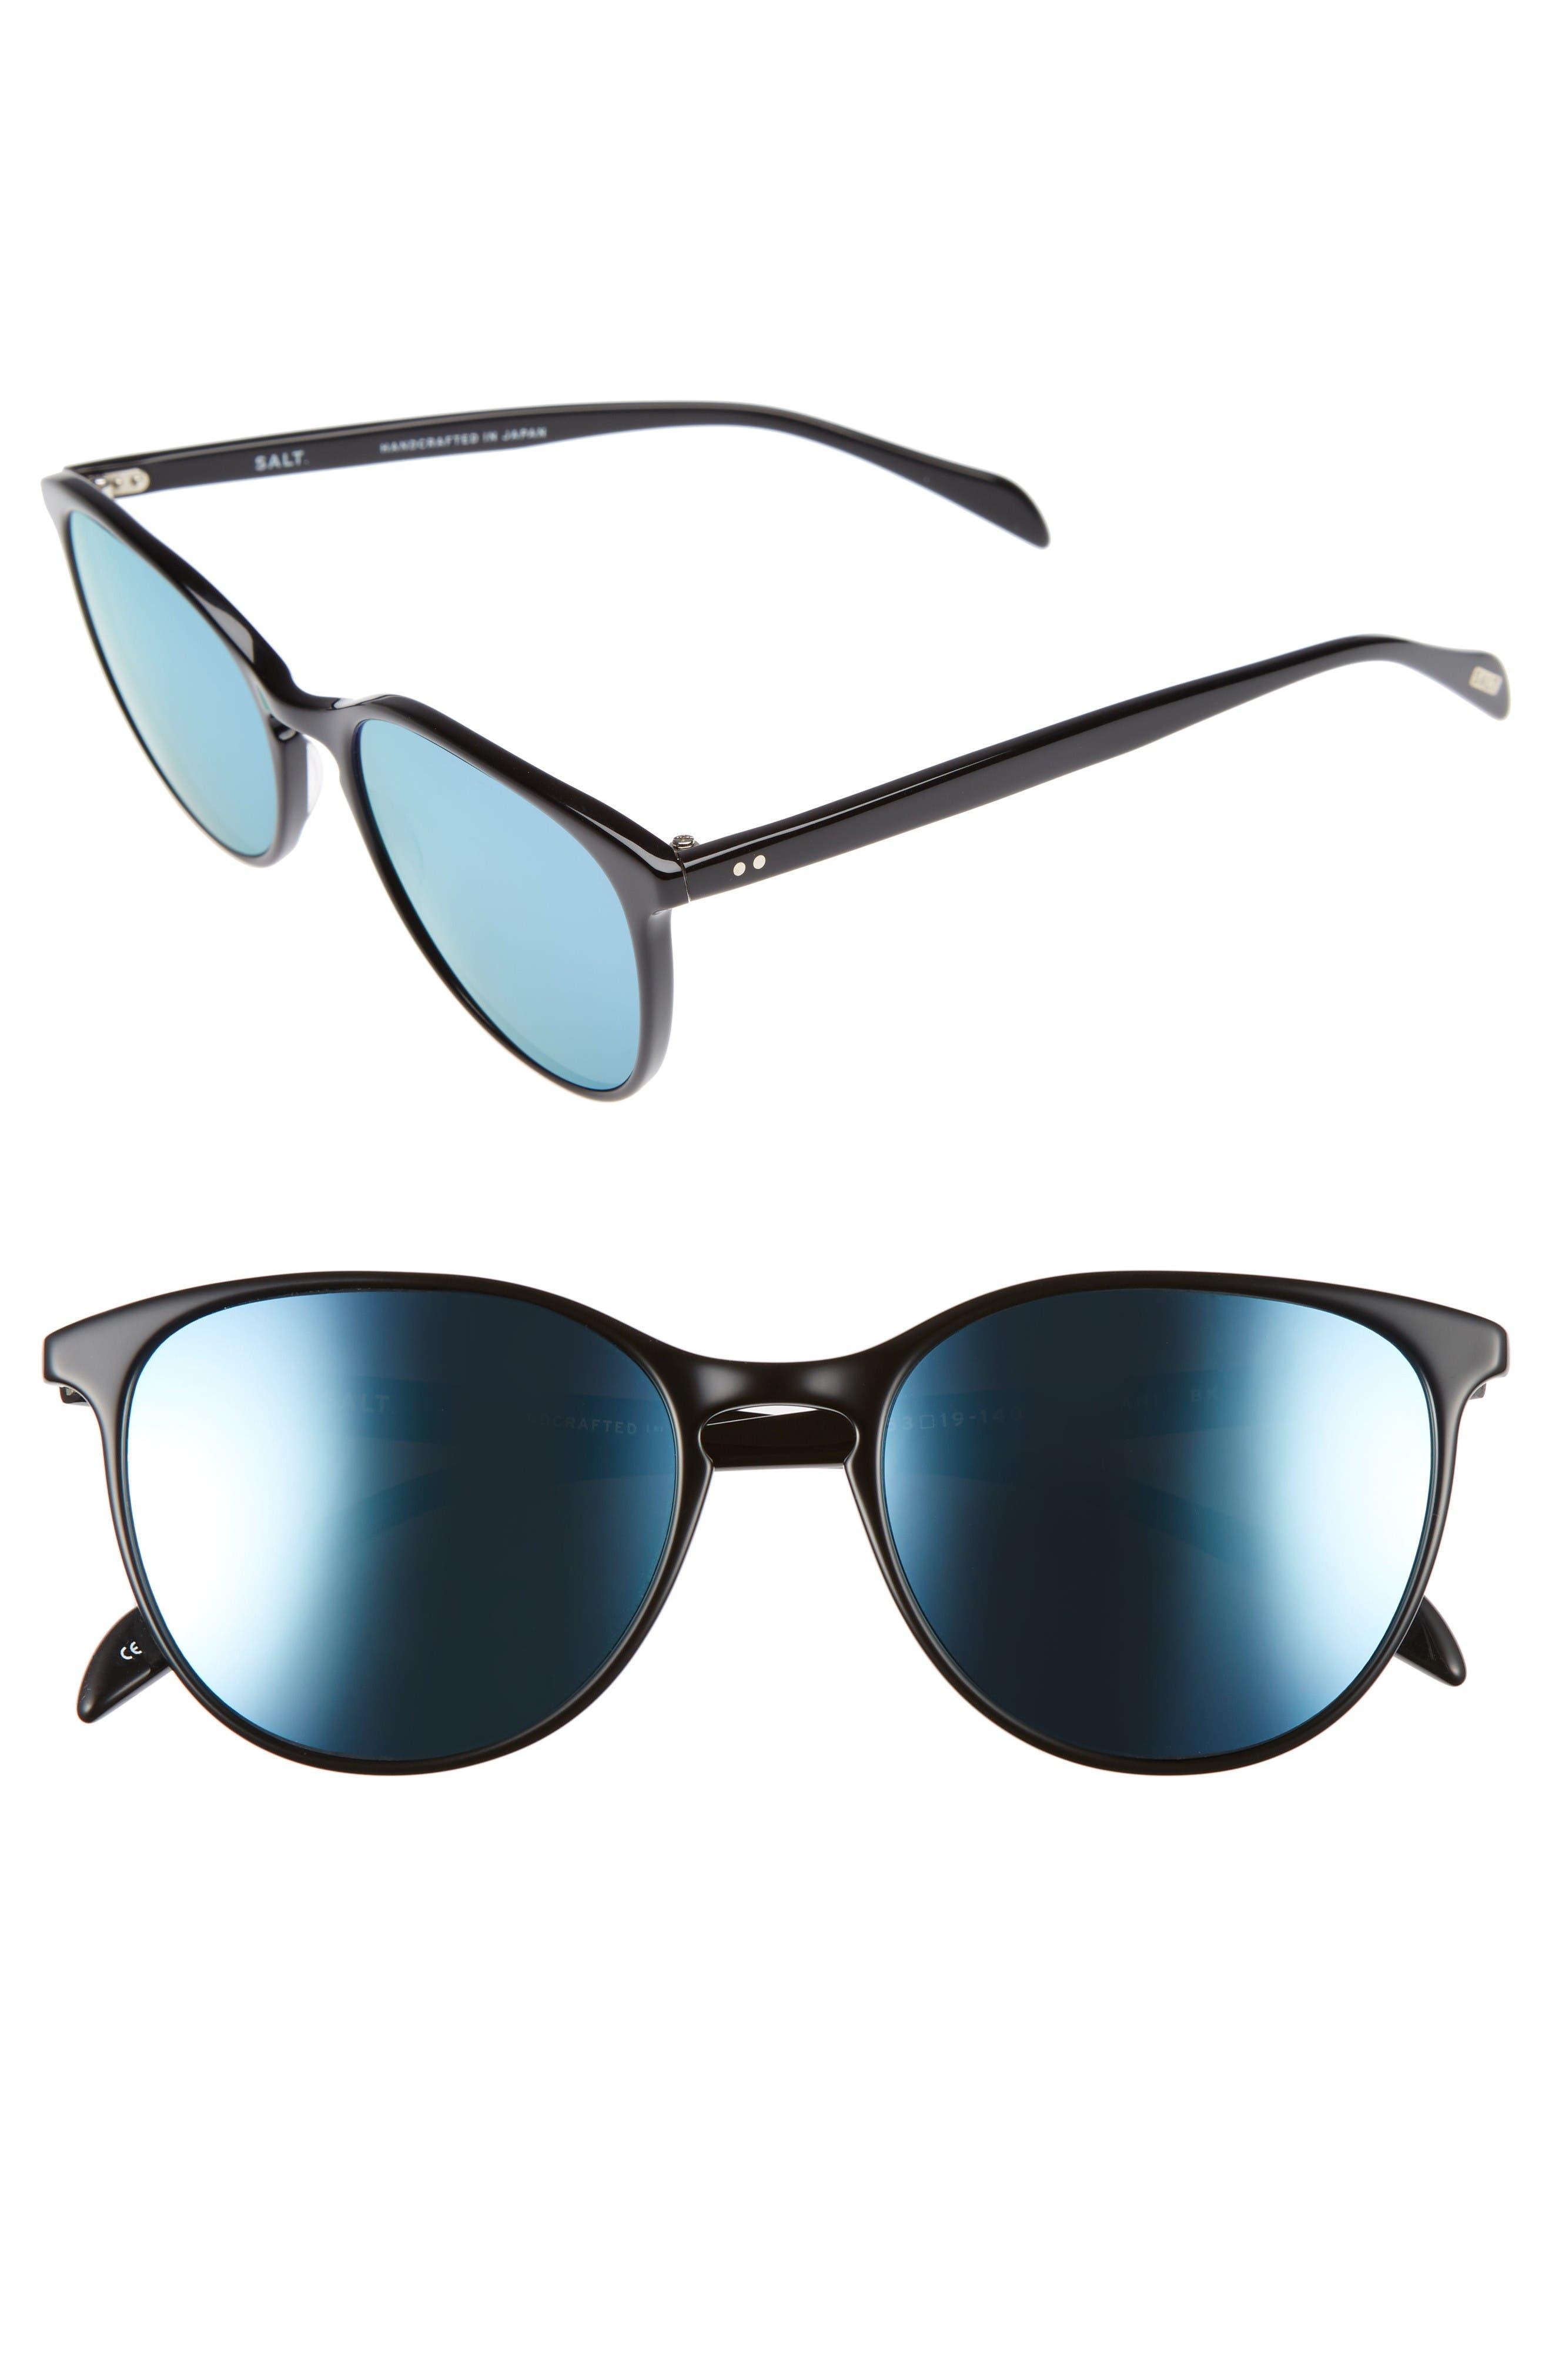 Kiani 53mm Polarized Retro Sunglasses,                         Main,                         color, Black/ Blue Mirror